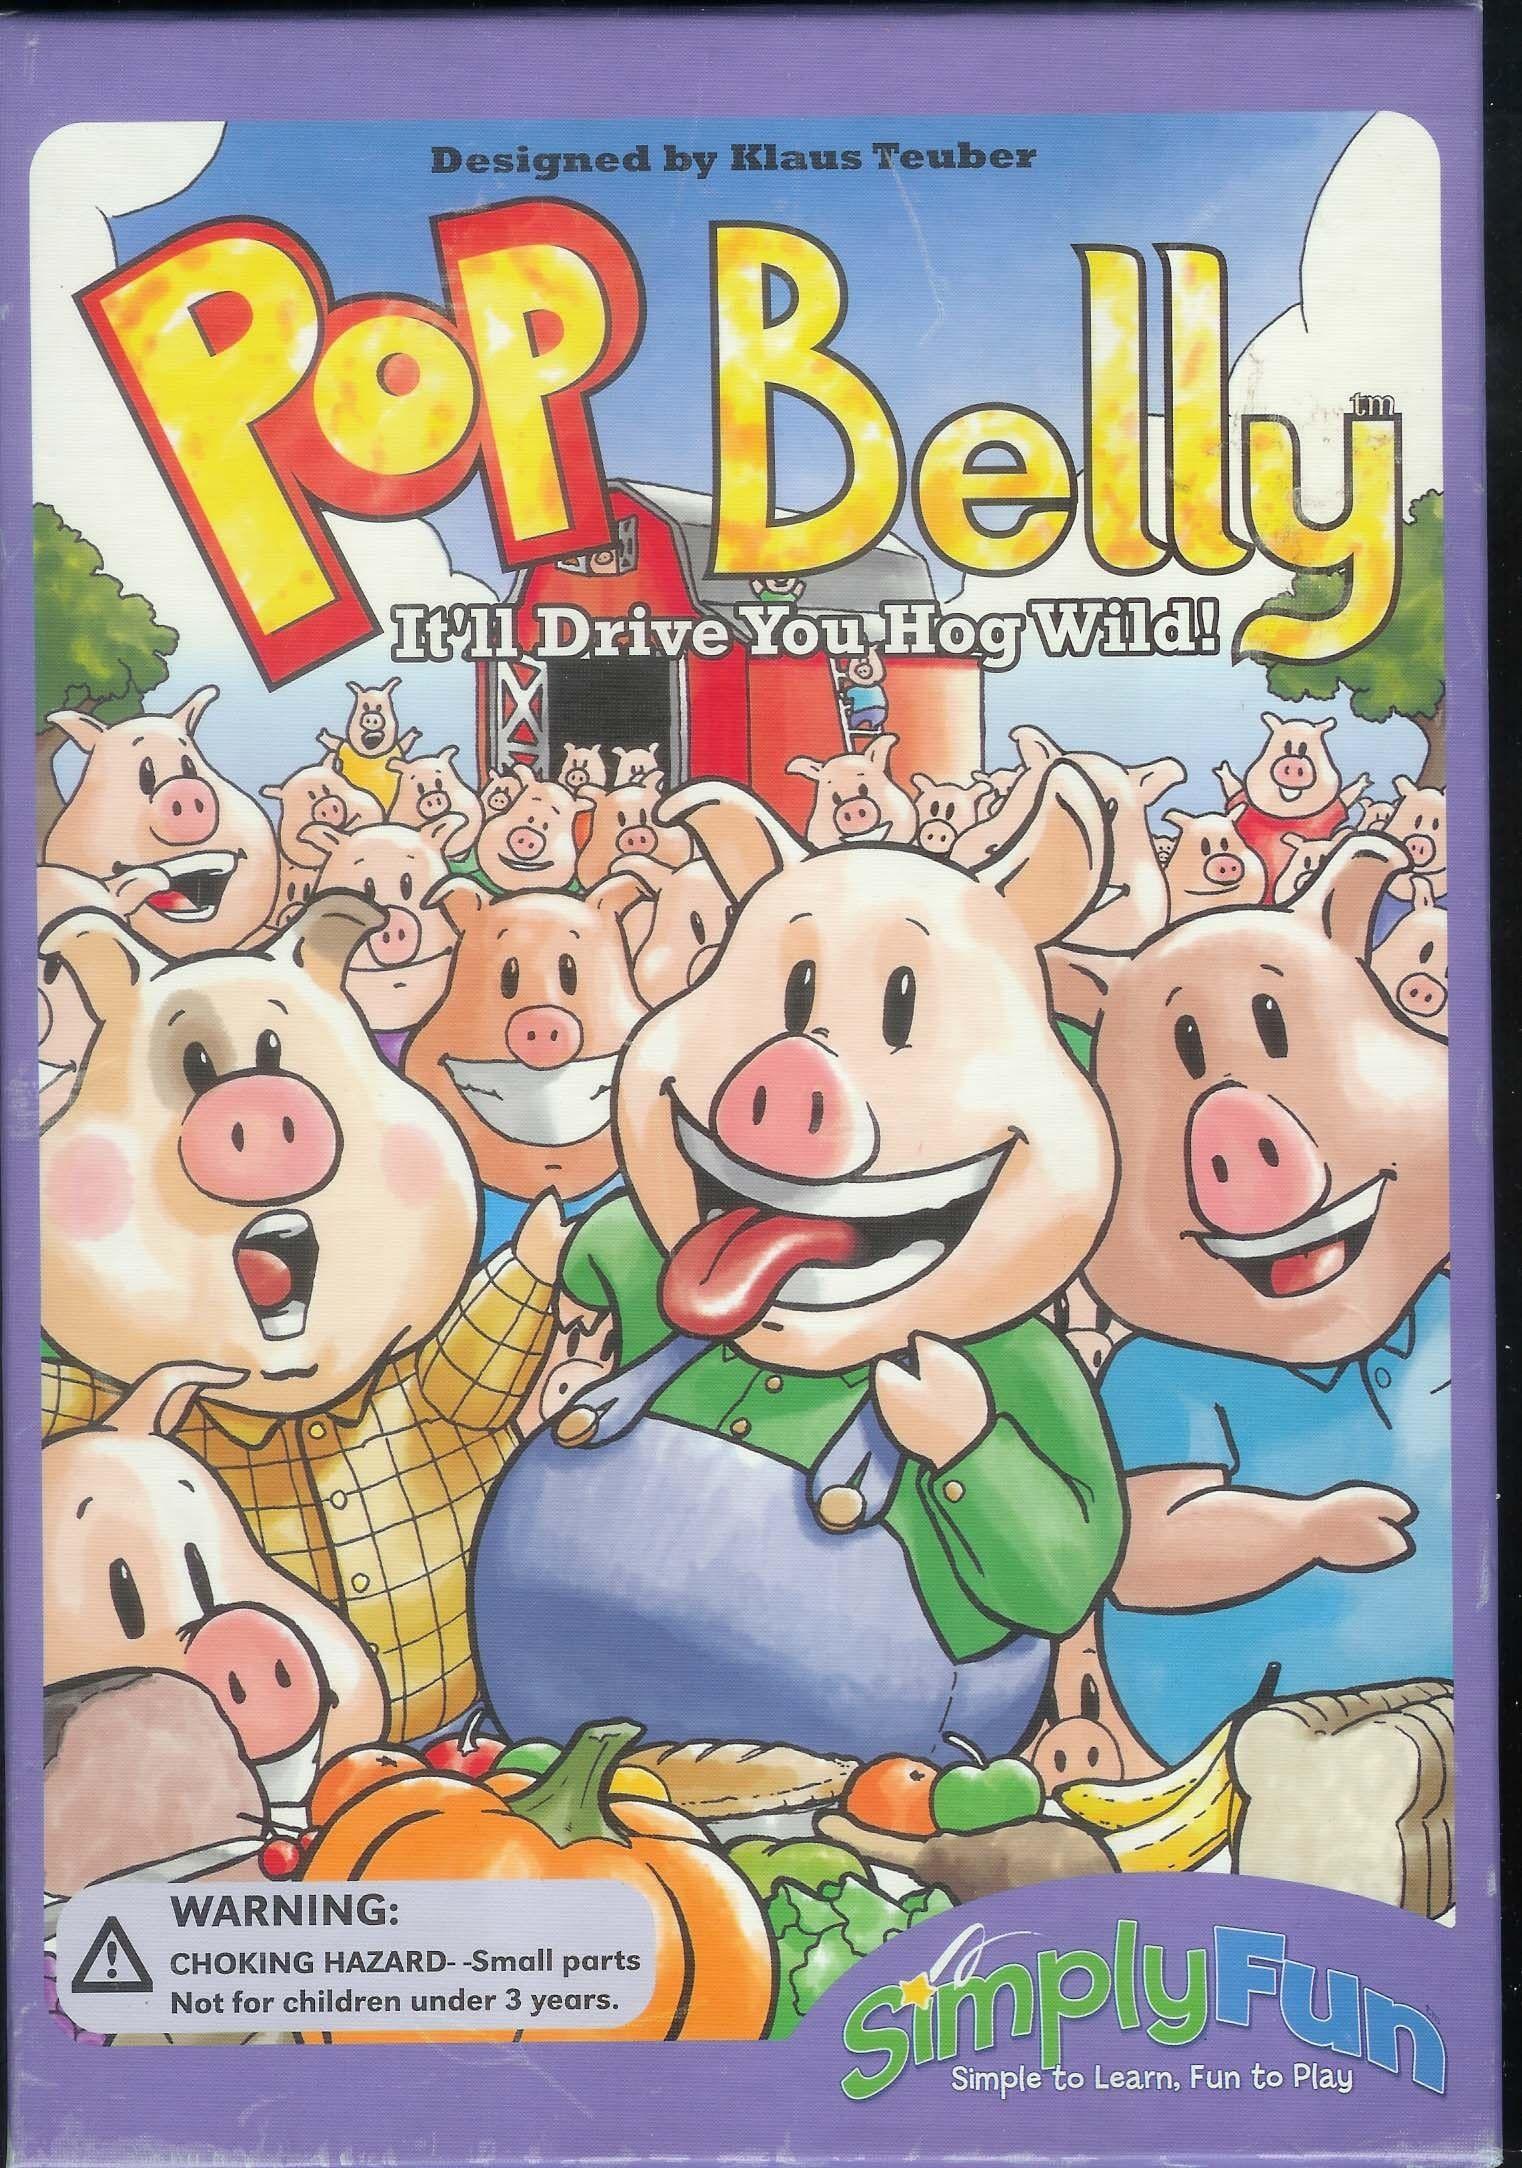 Pop Belly